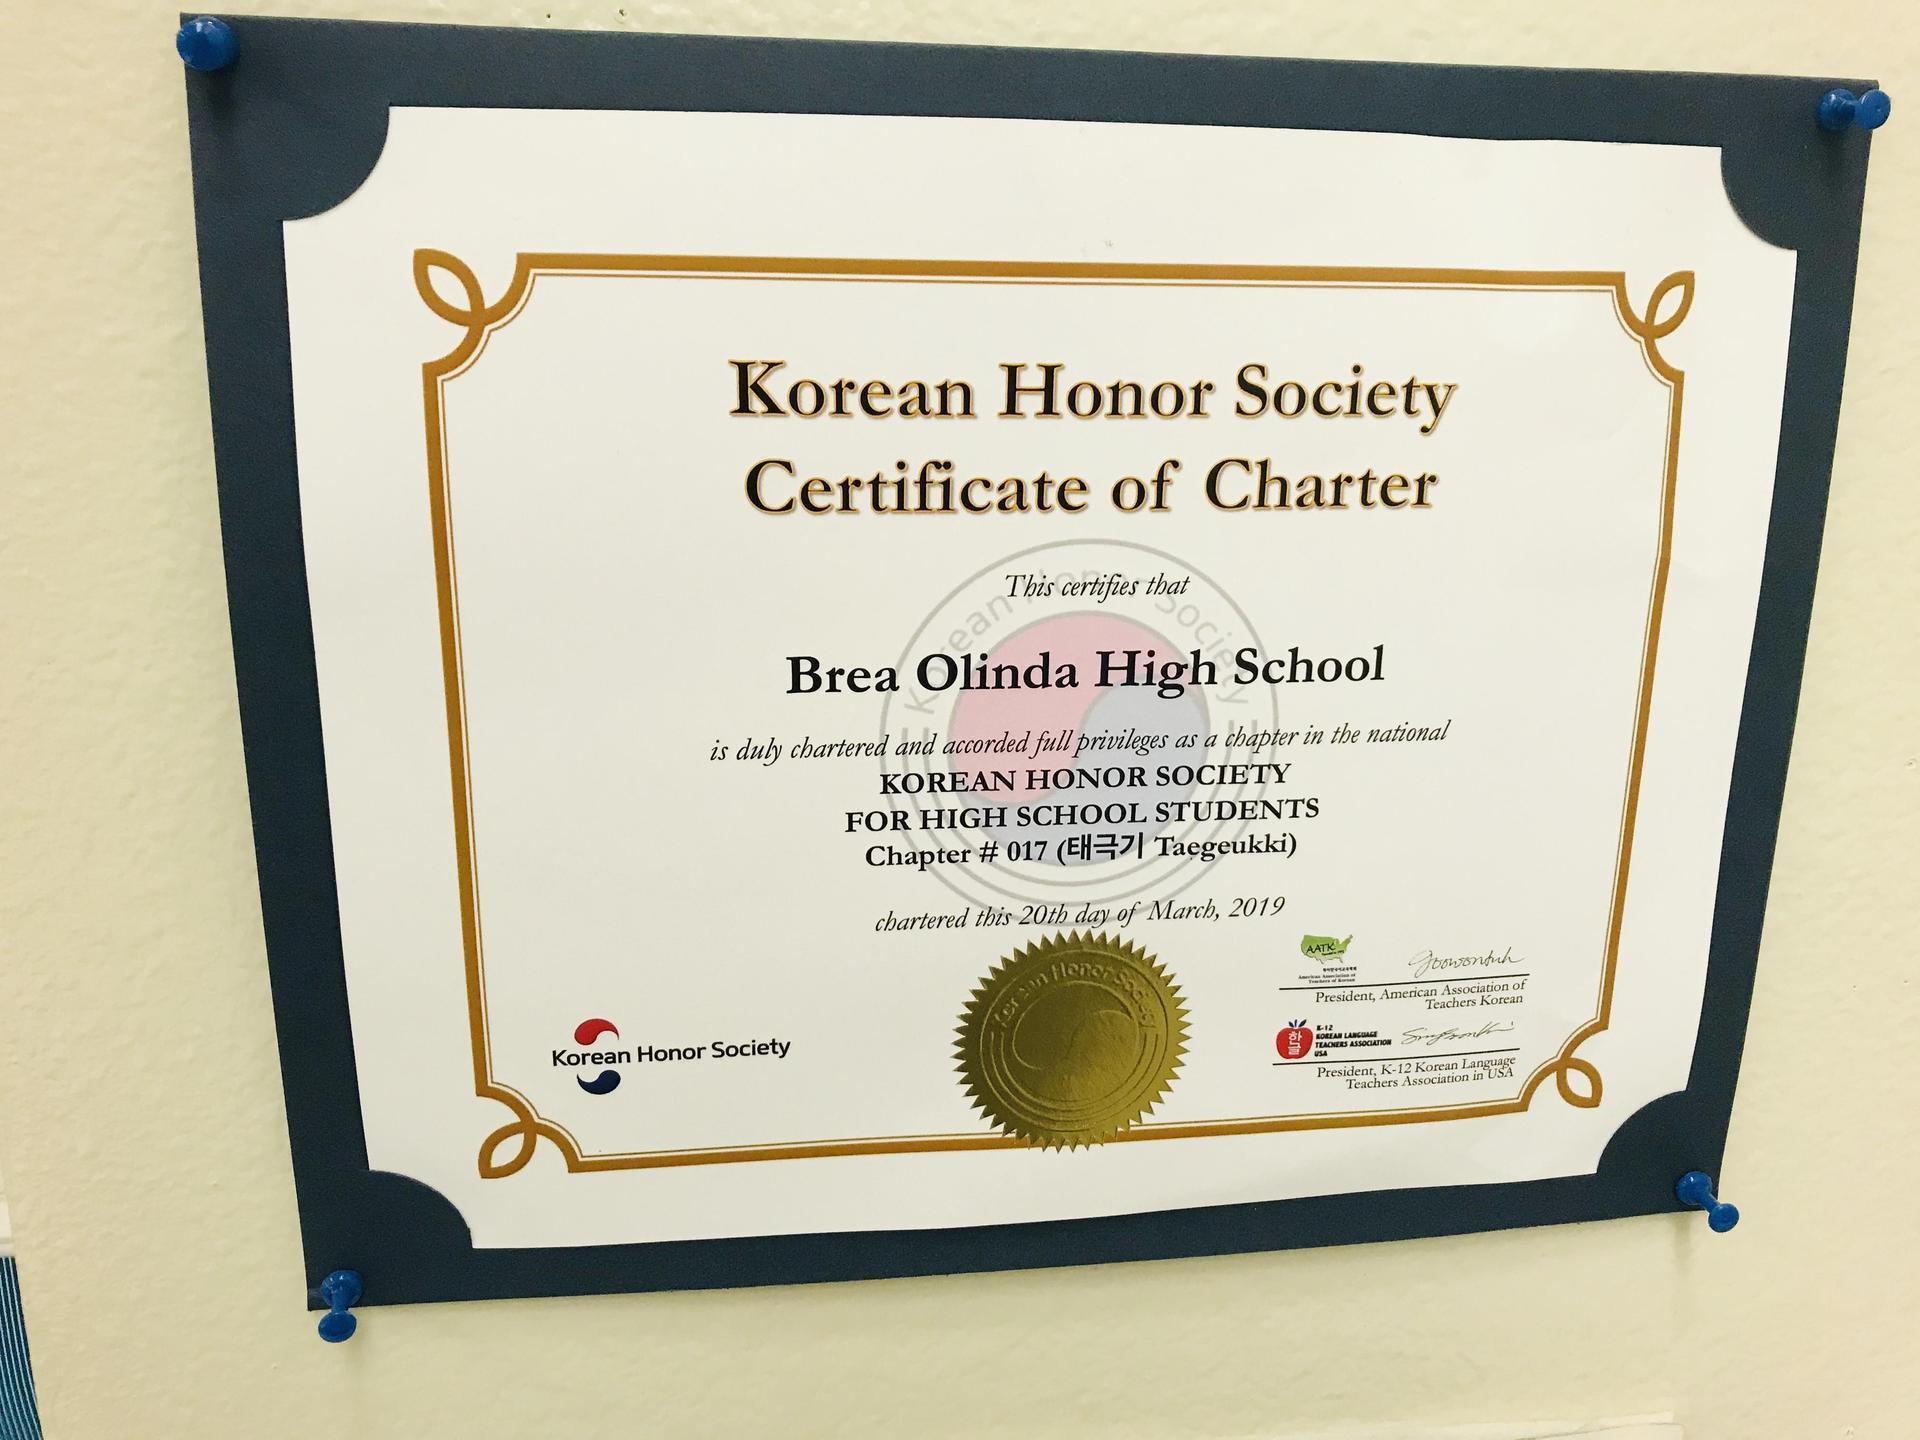 Korean Class Picture 8